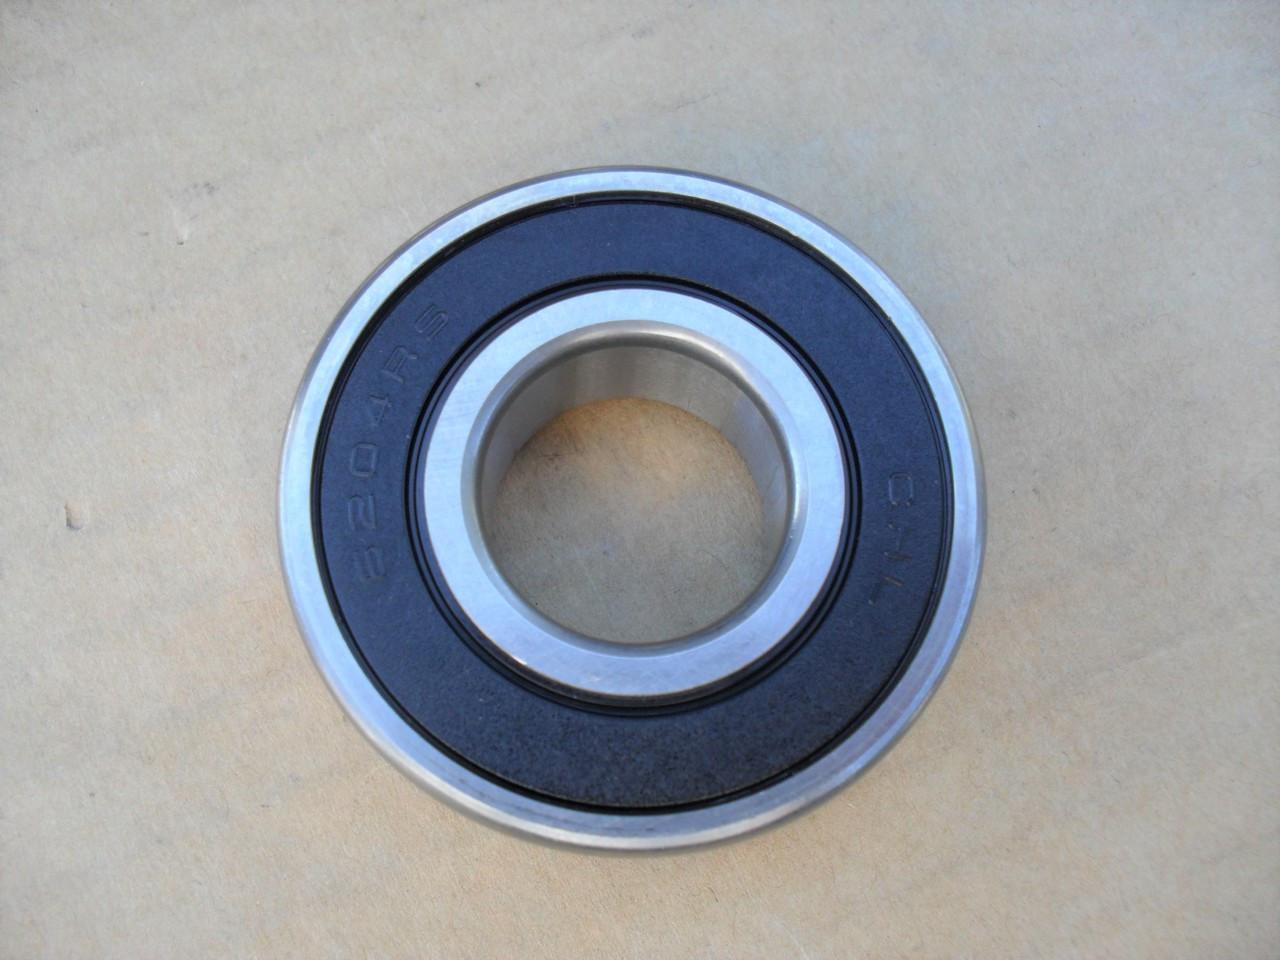 MTD LAWNFLITE YARDMAN CADET DECK BLADE BEARINGS x4 741-0919 954-0919